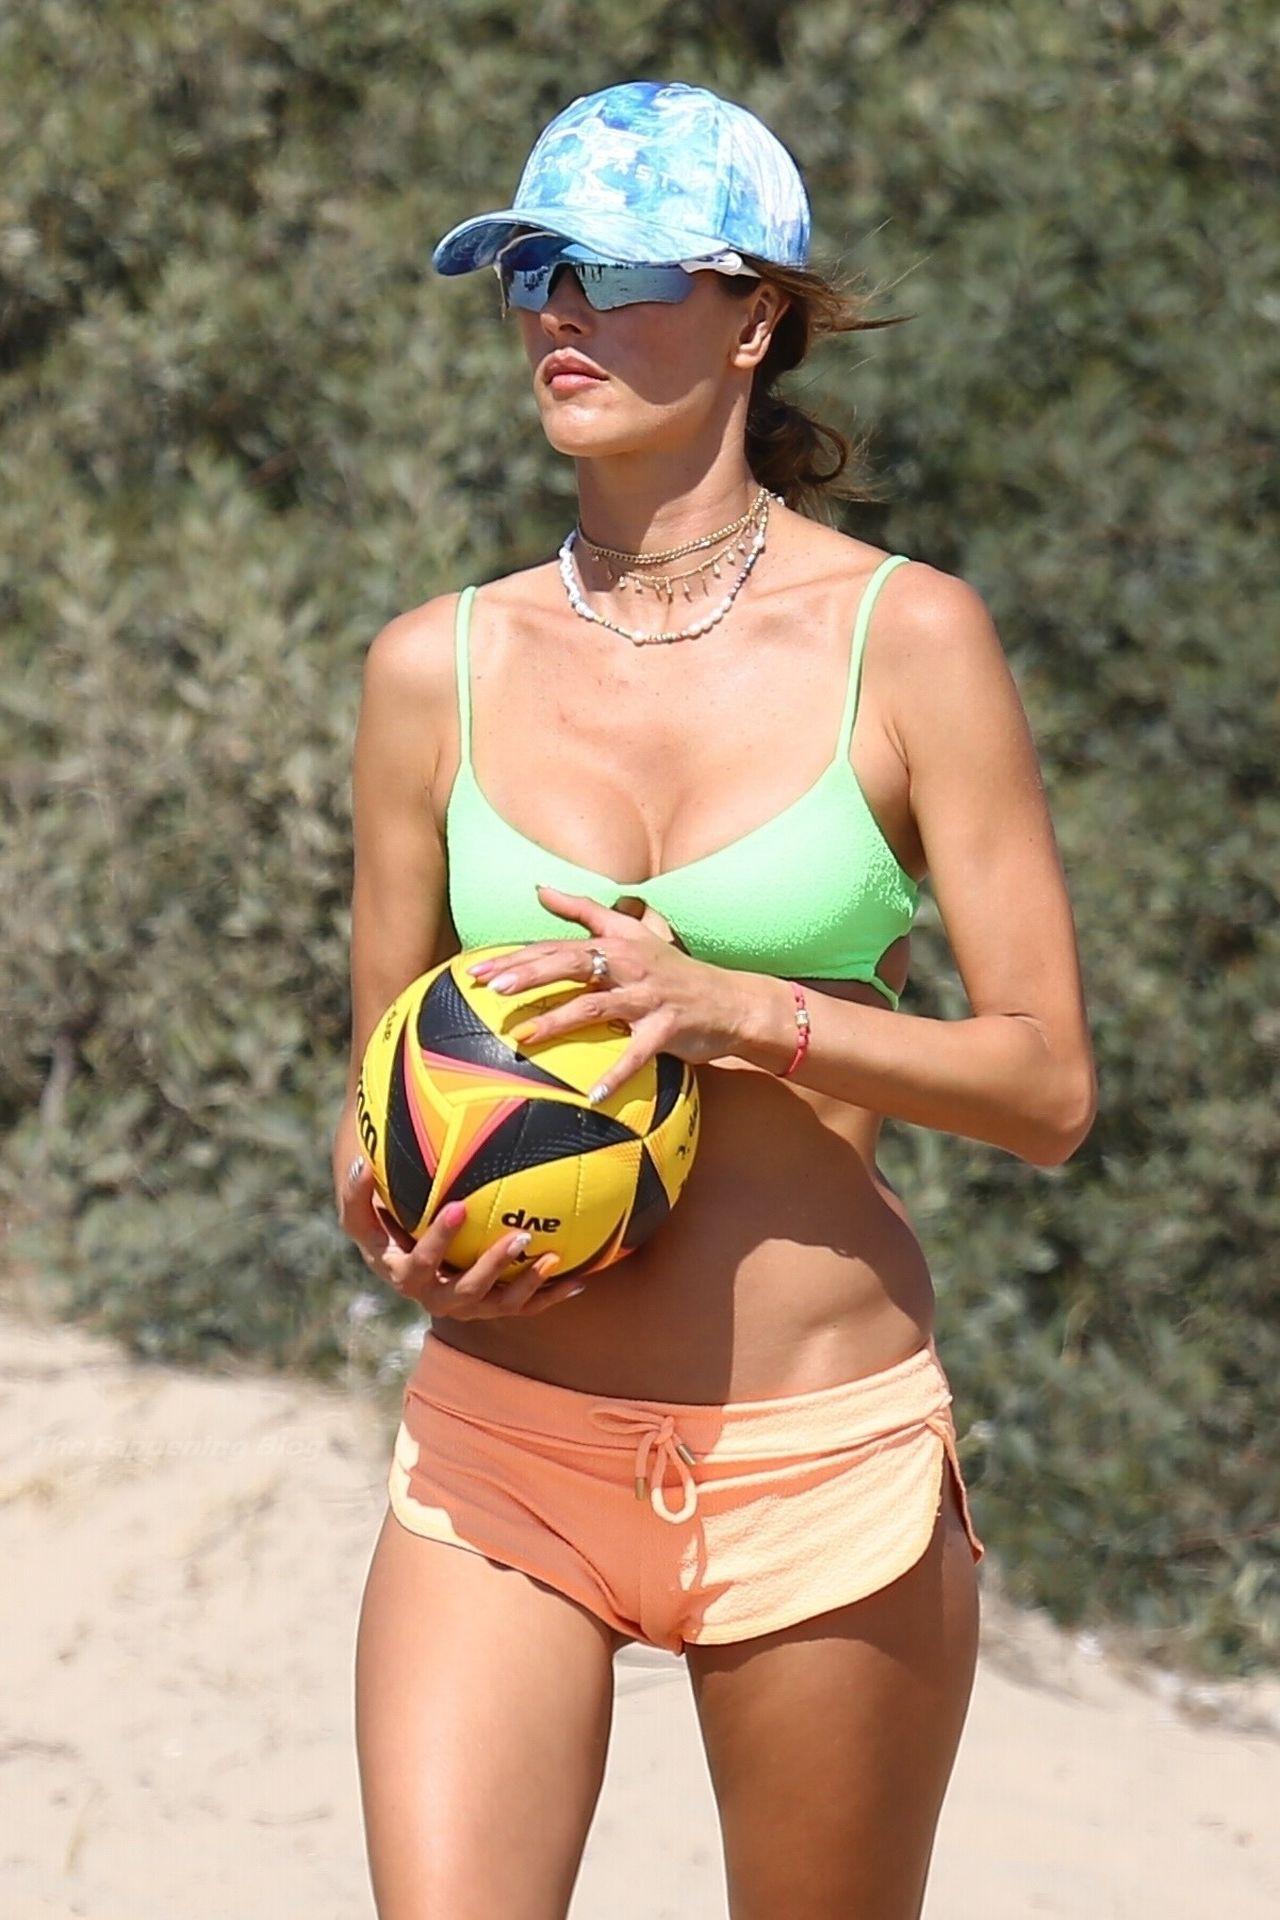 Alessandra-Ambrosio-Sexy-The-Fappening-Blog-191.jpg